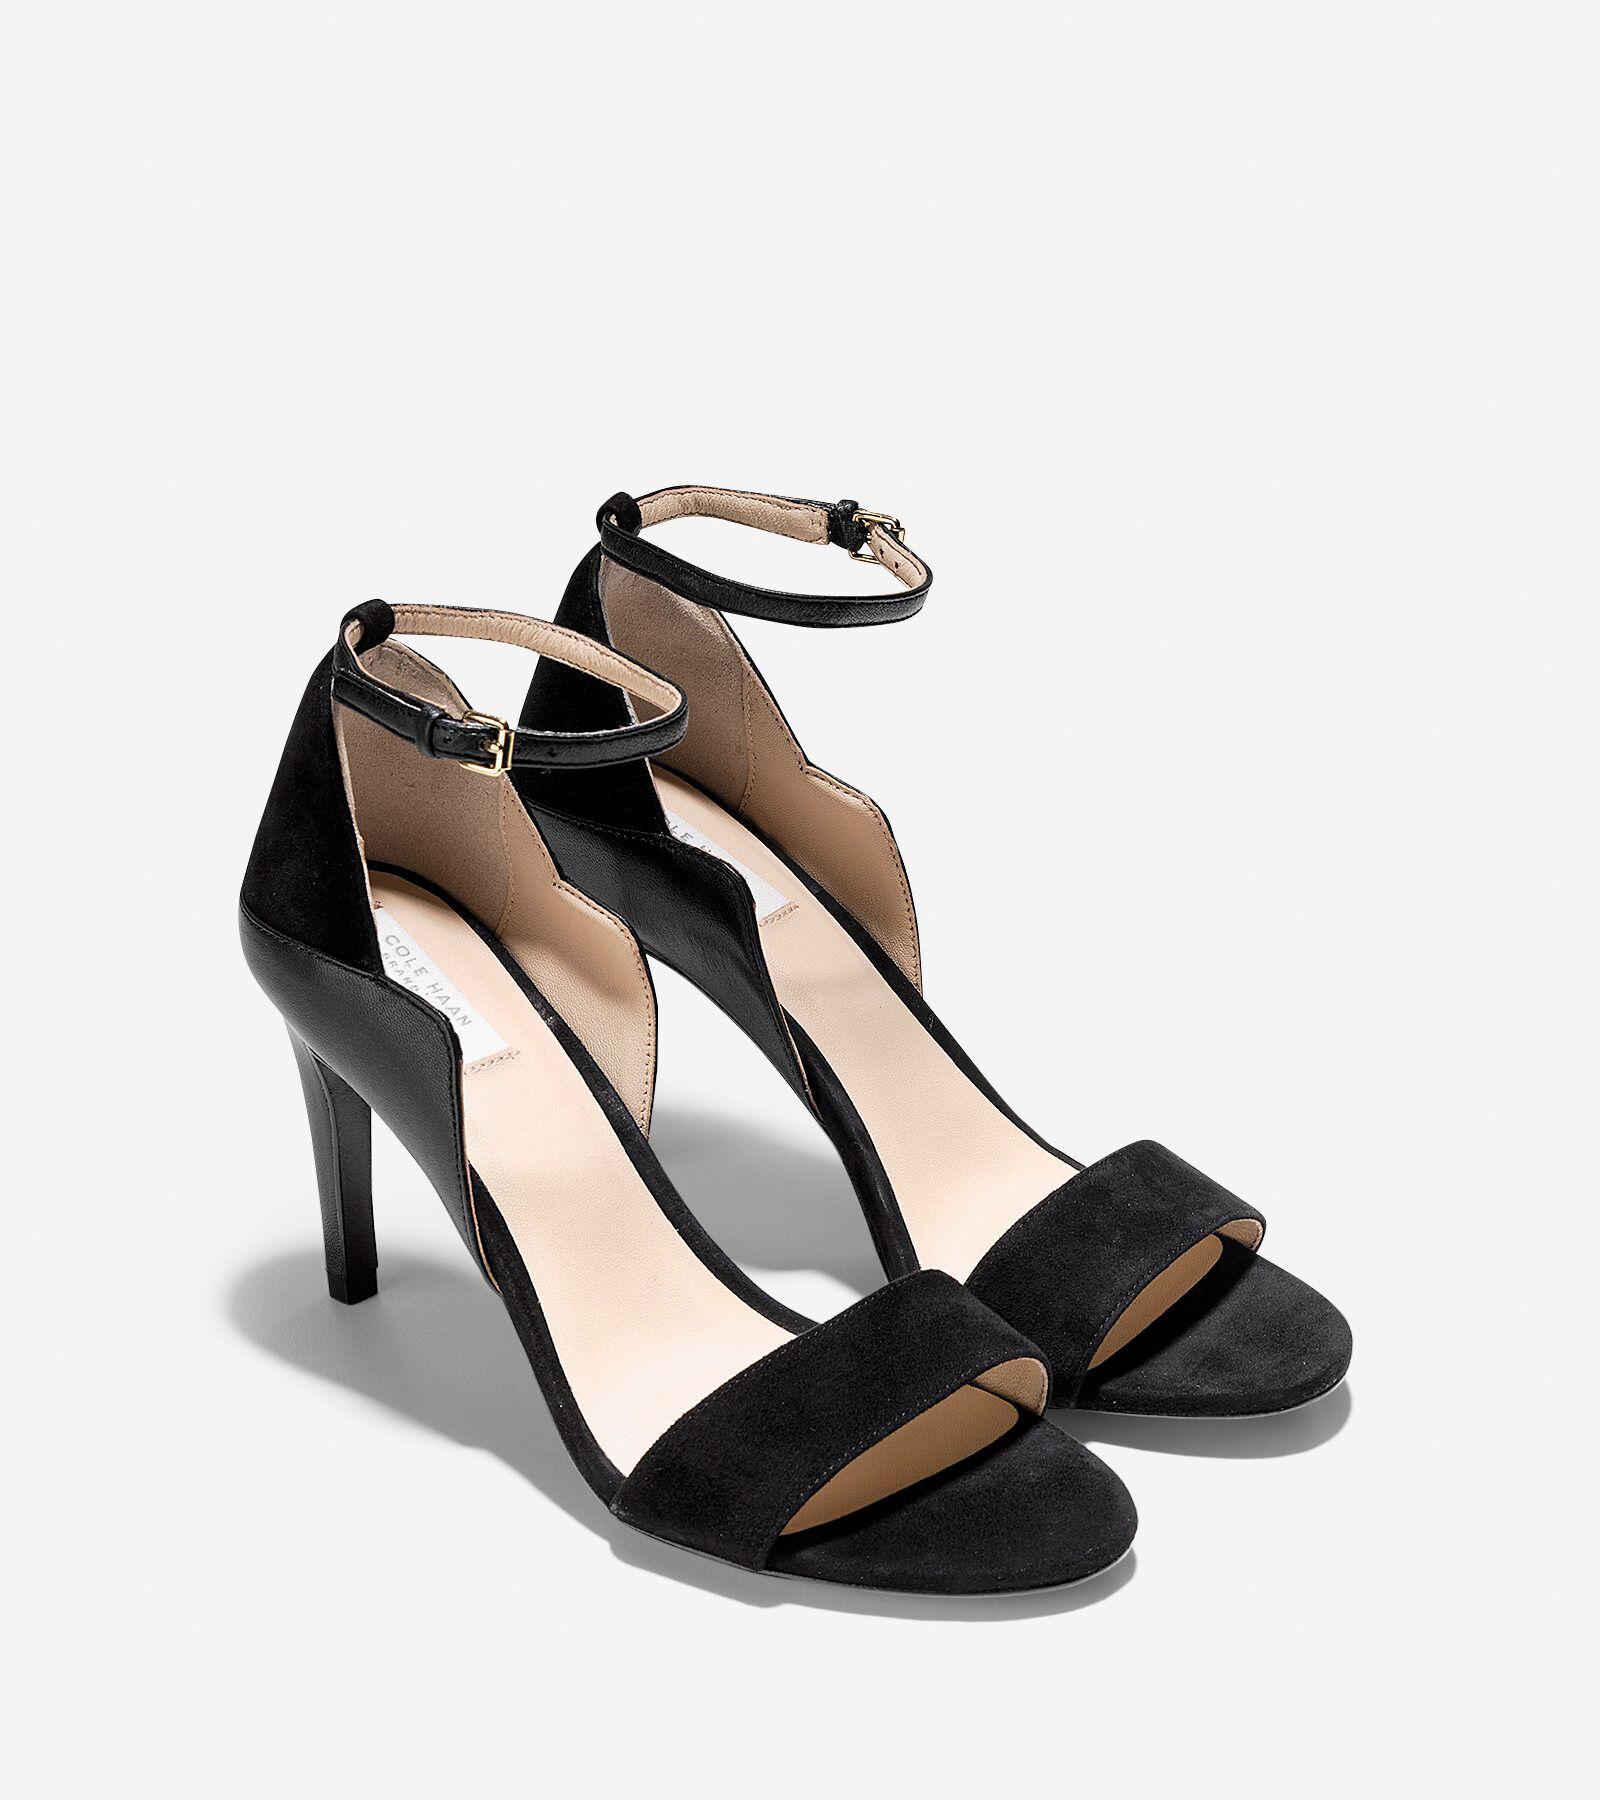 Lowest Price For Sale FOOTWEAR - Sandals Grace Clearance Cheap Online 0rRjHjKYwK